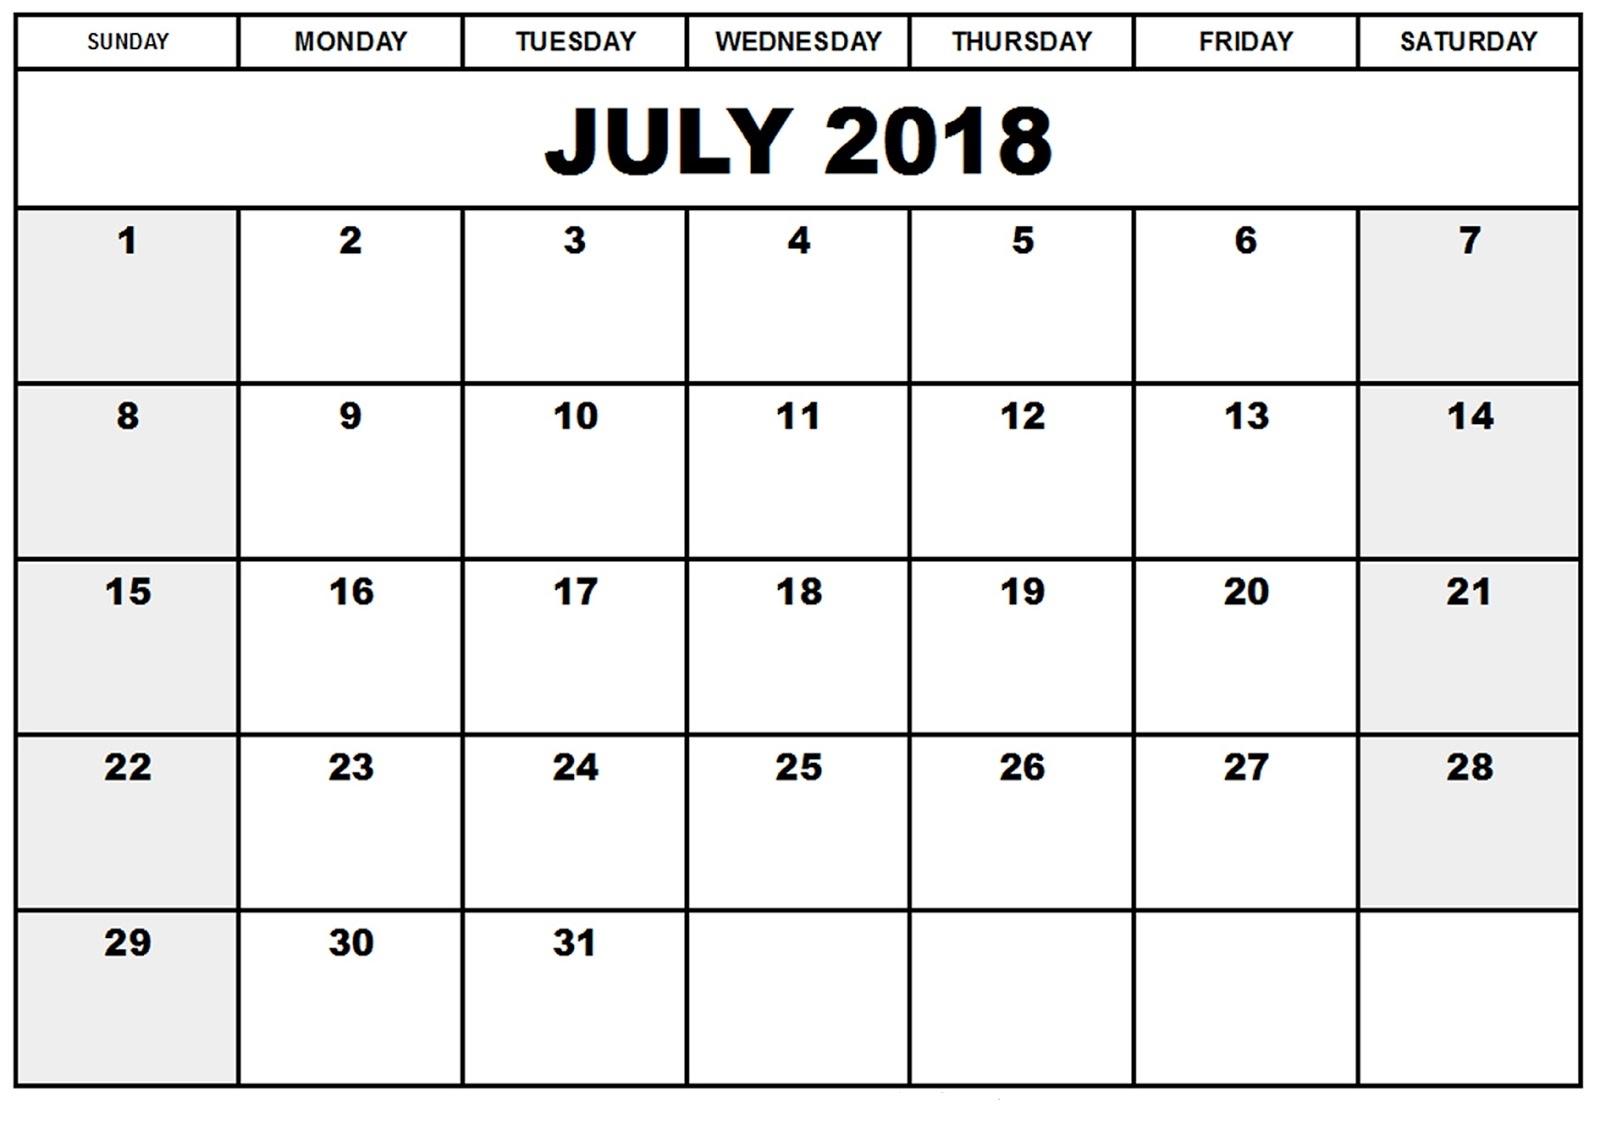 Free July 2018 Calendar Template Targergolden Dragonco  Xjb